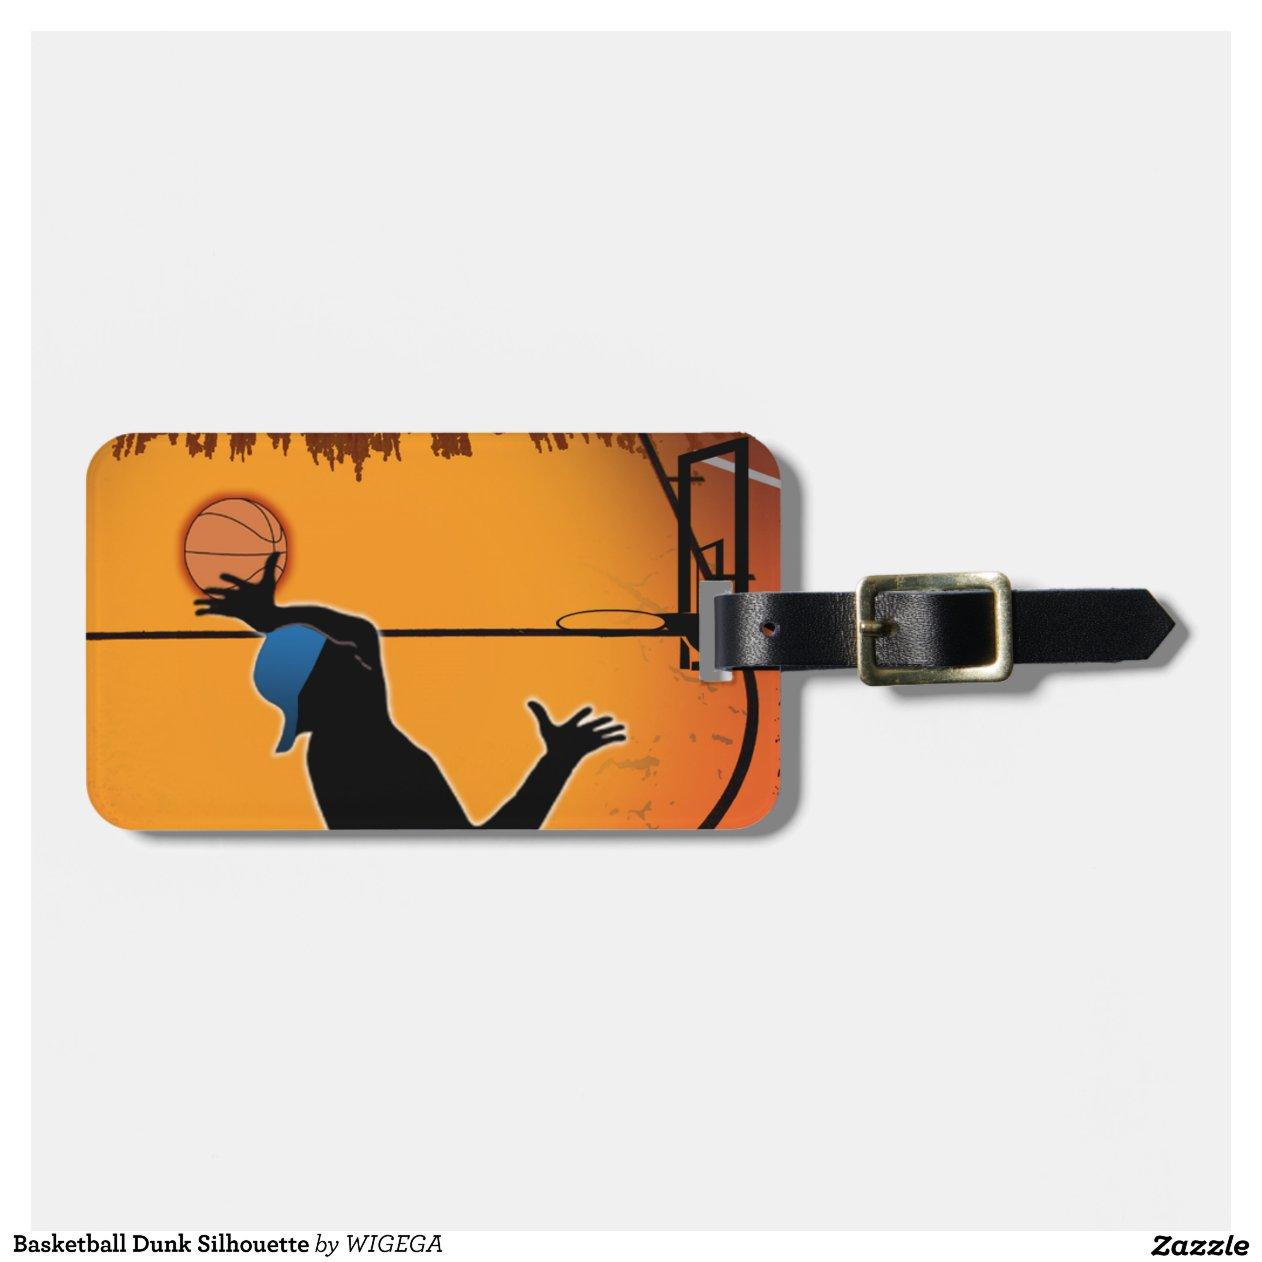 basketball dunk silhouette tiquette de bagage zazzle. Black Bedroom Furniture Sets. Home Design Ideas